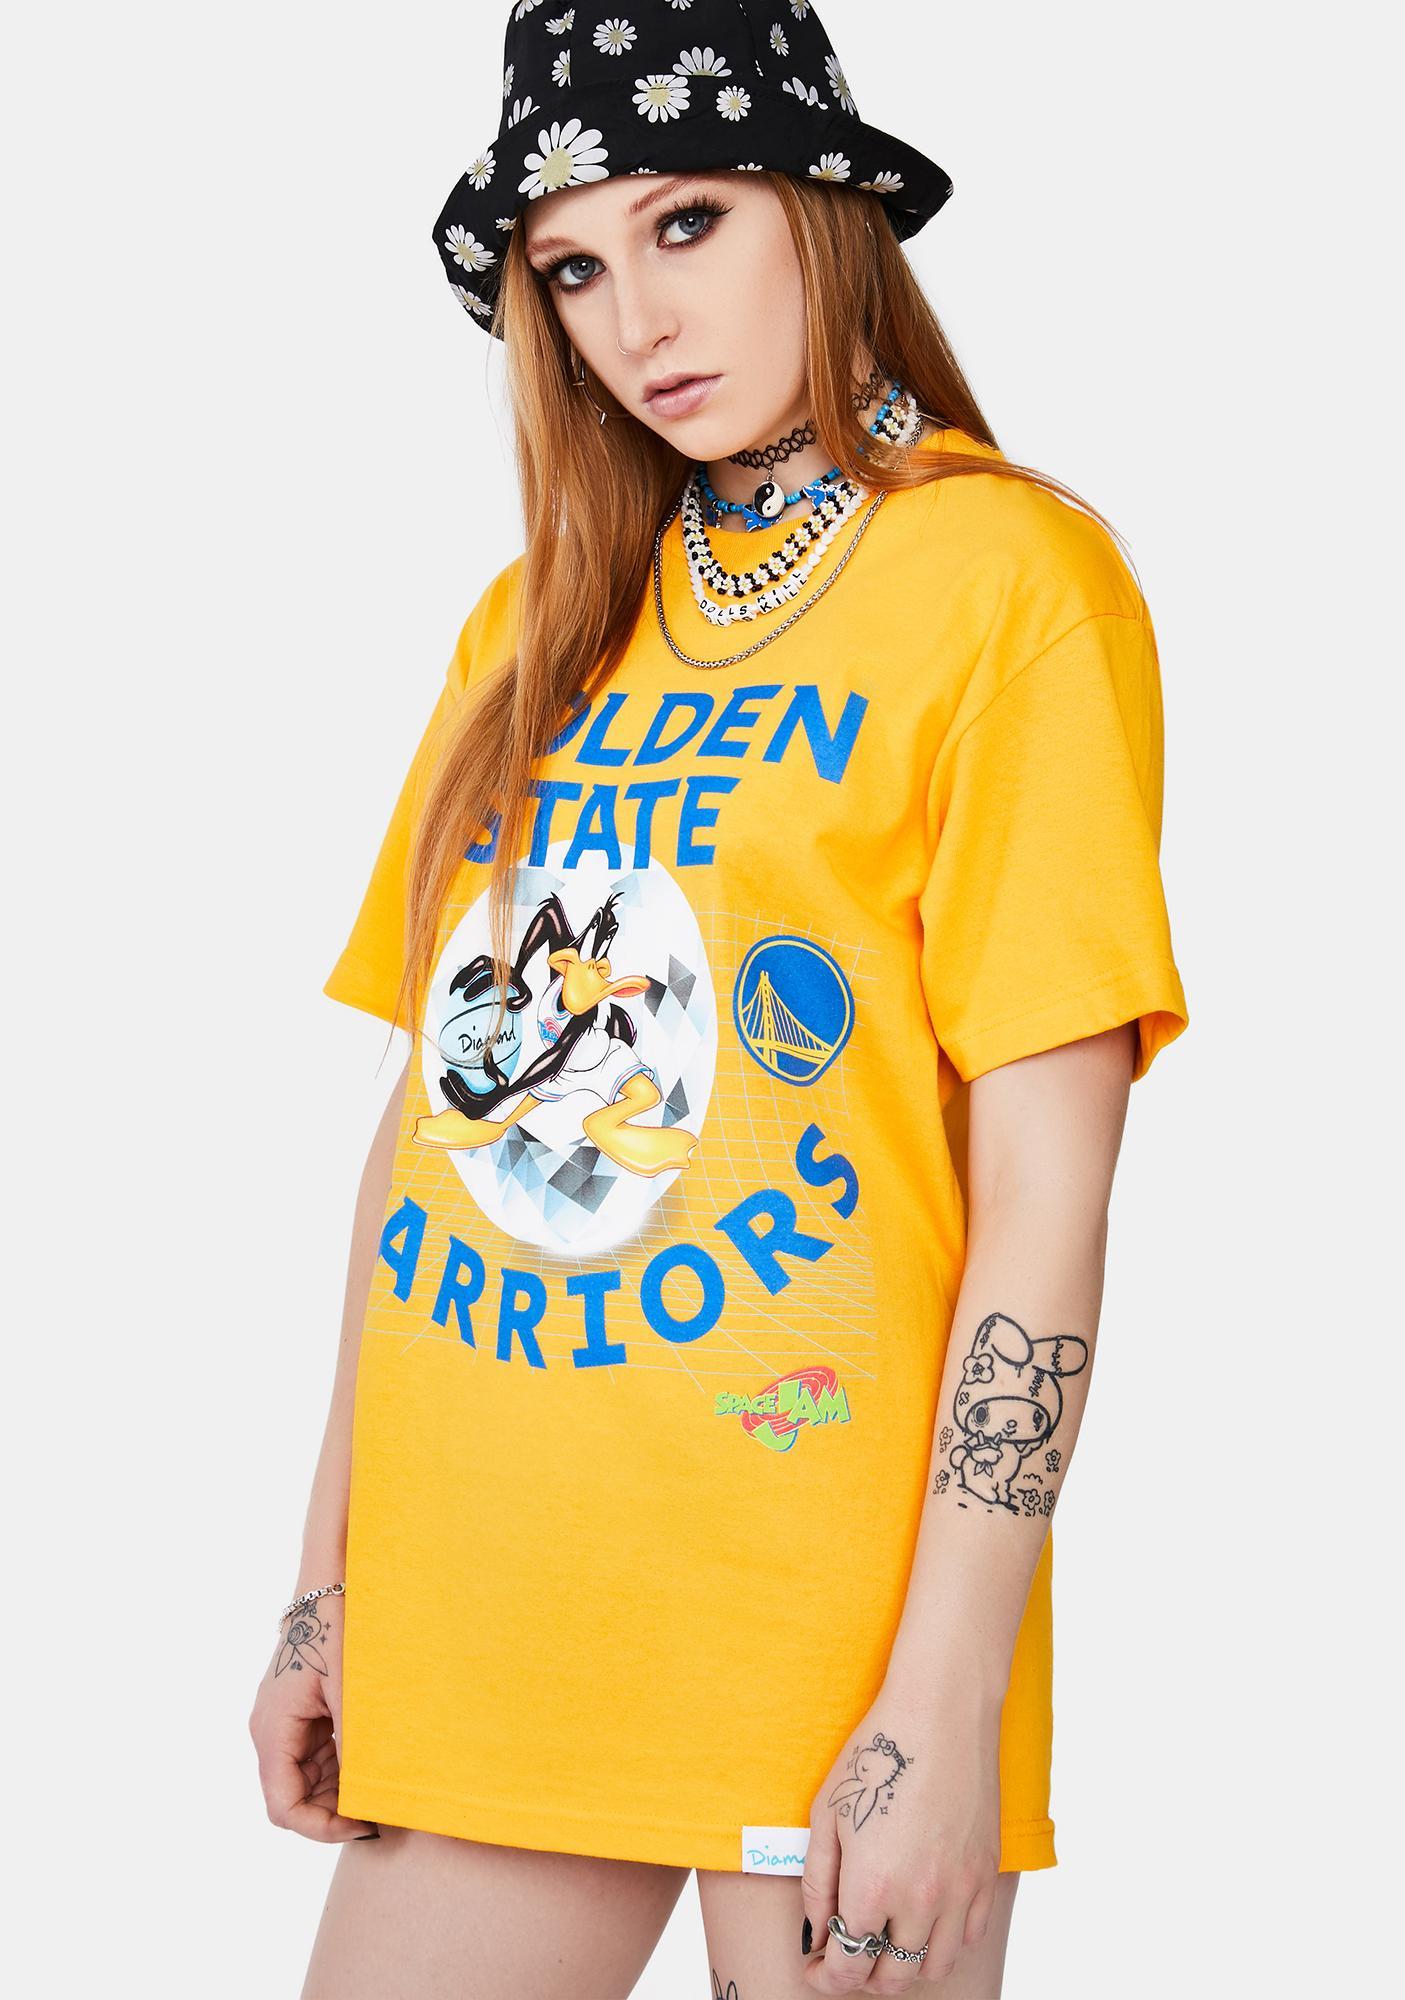 Diamond Supply Co NBA X Space Jam Golden State Warriors Graphic Tee